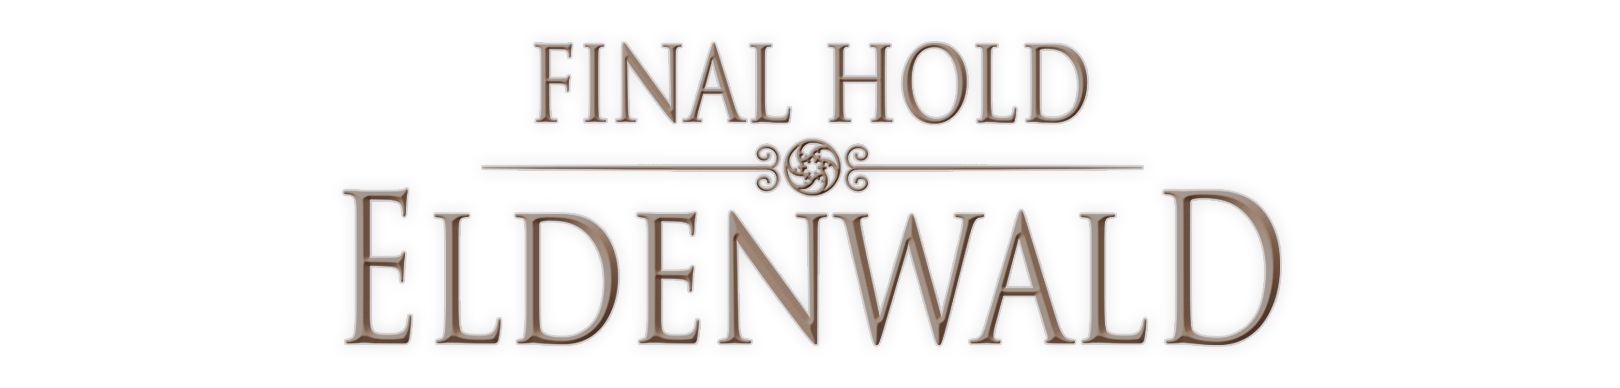 Final Hold: Eldenwald